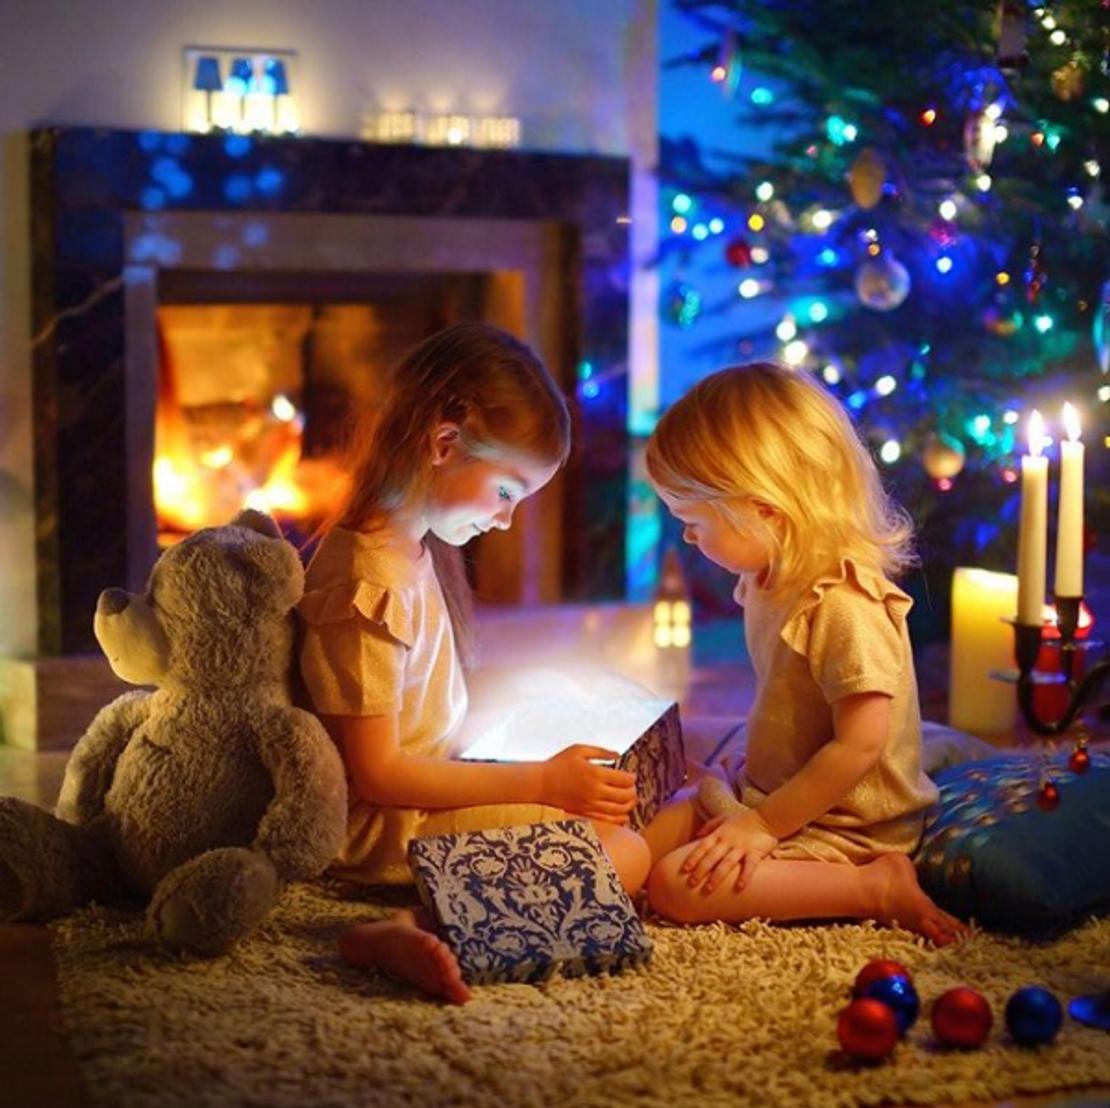 Christmas Magic: The Wonder of Giving